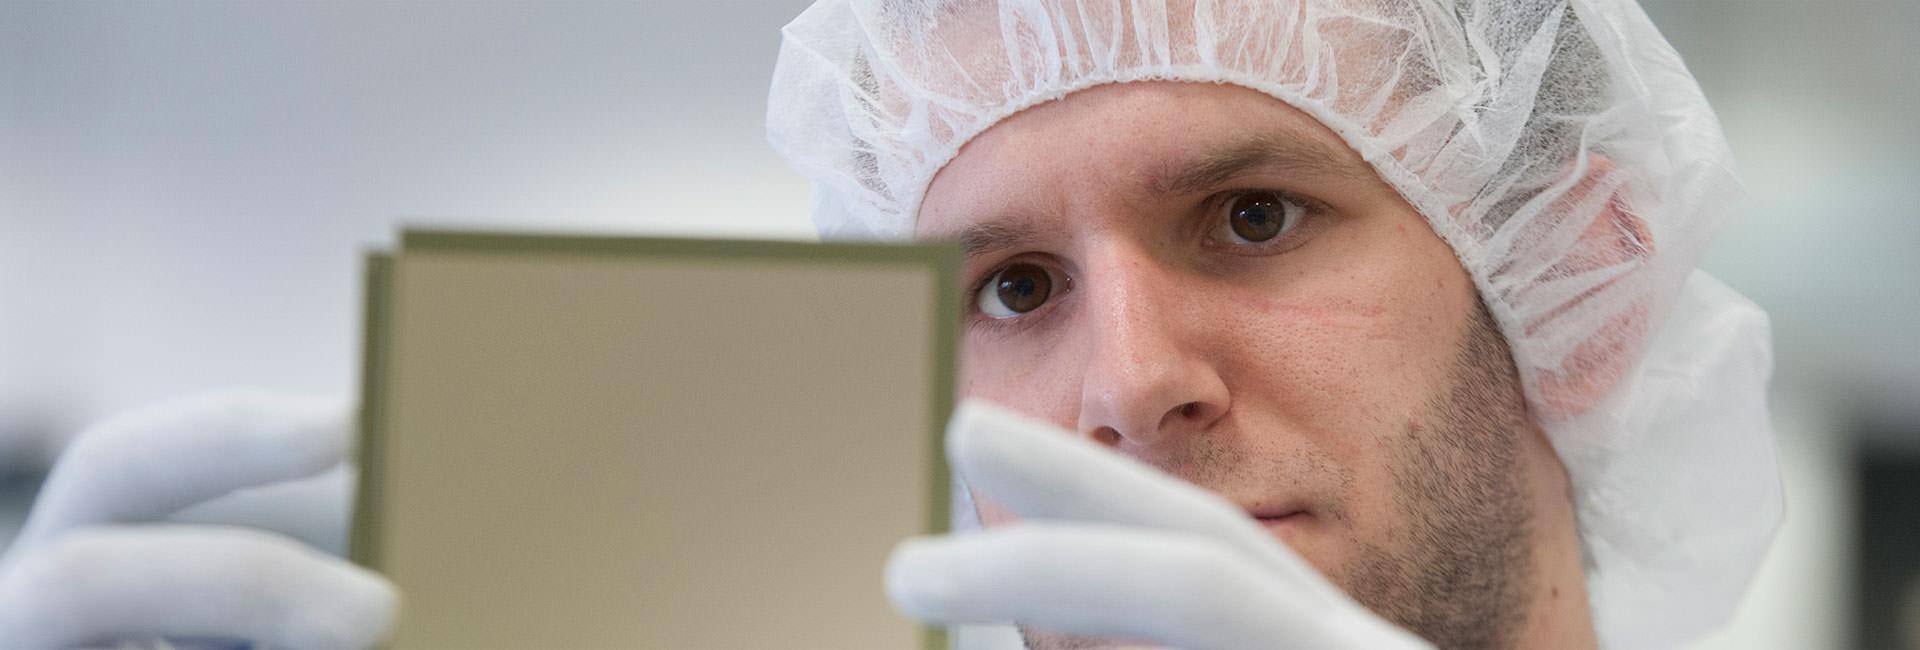 Man holding an OLED lighting panel